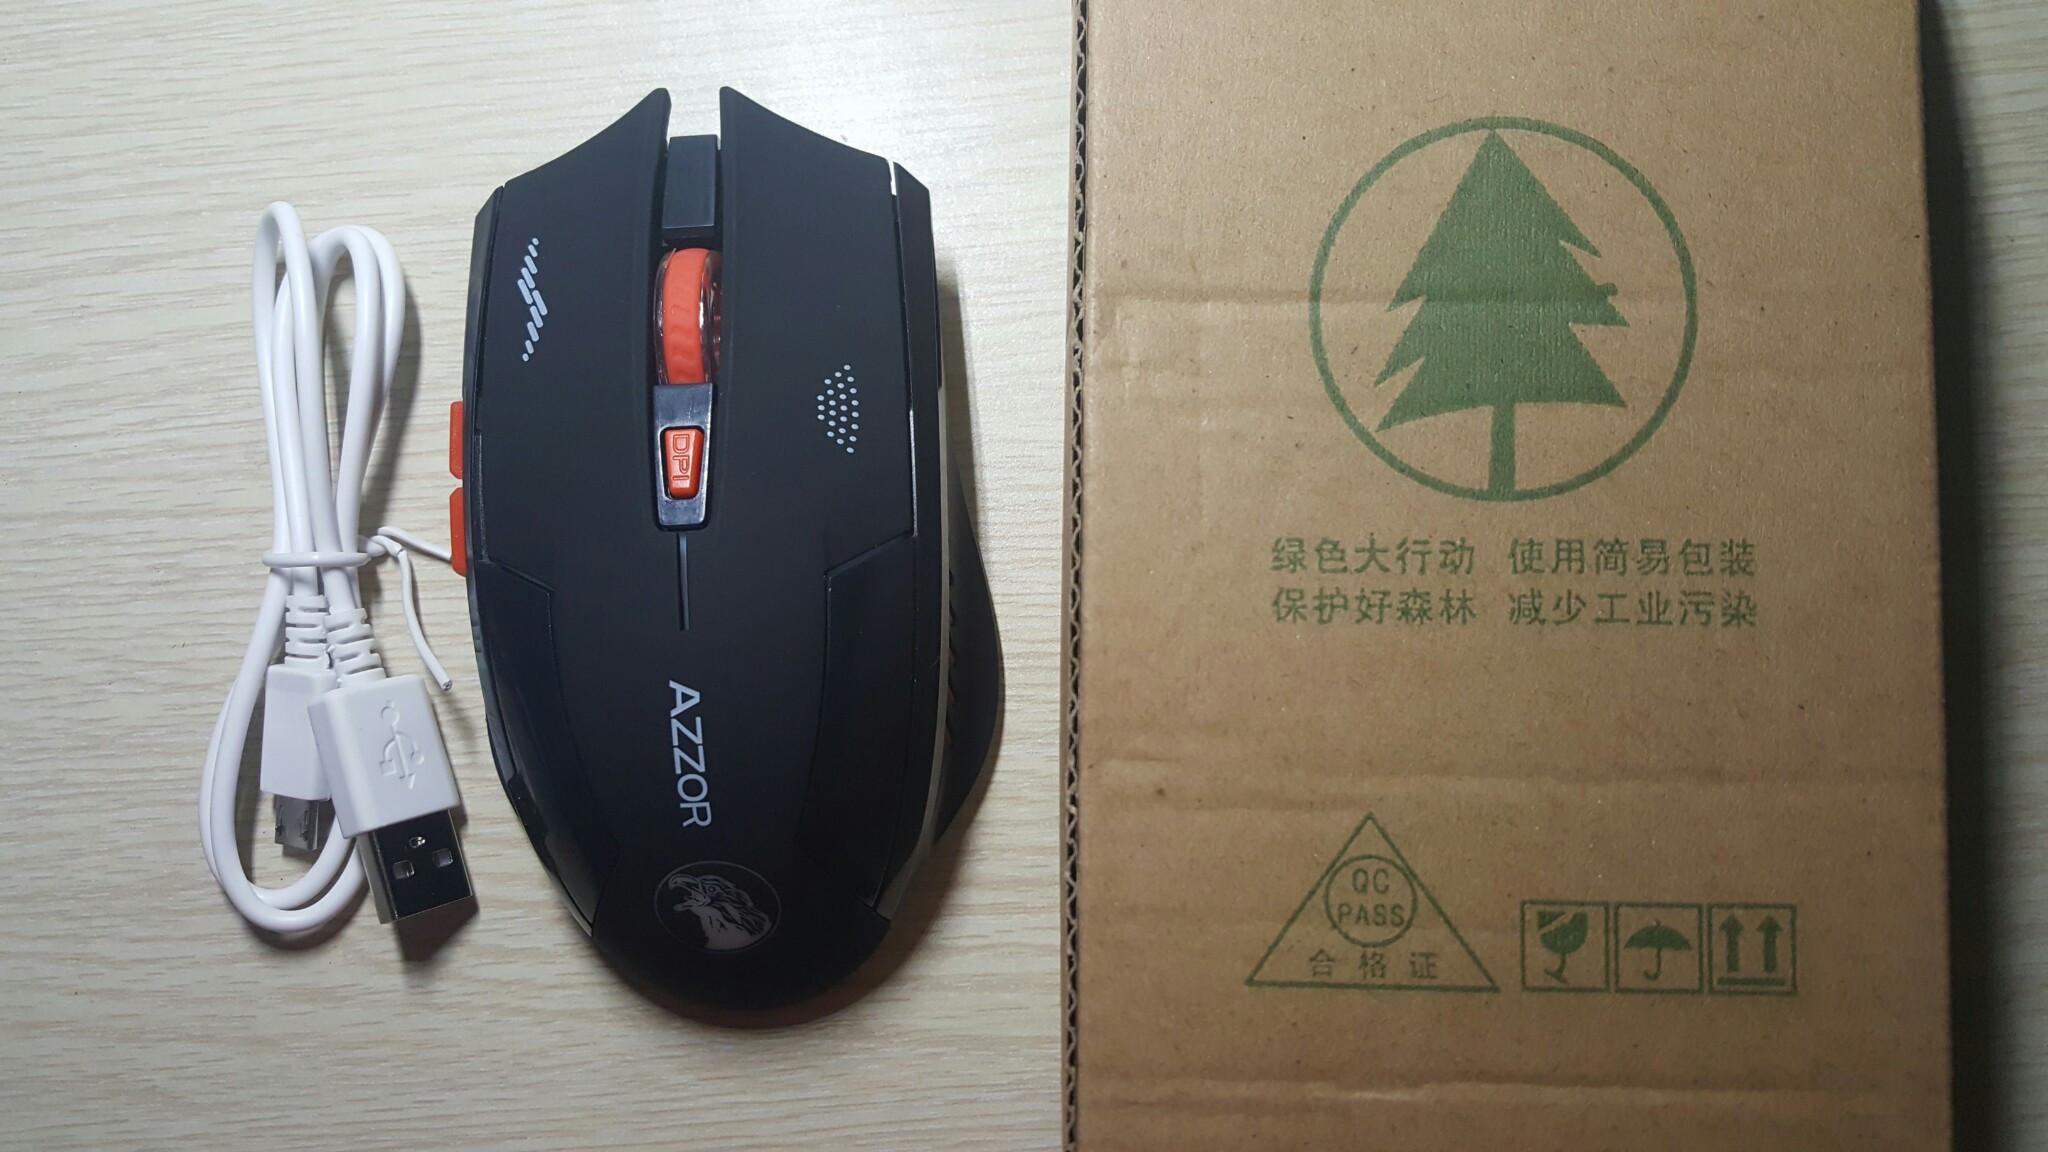 chuot-game-azzor-tang-fan-vpsgiare-1